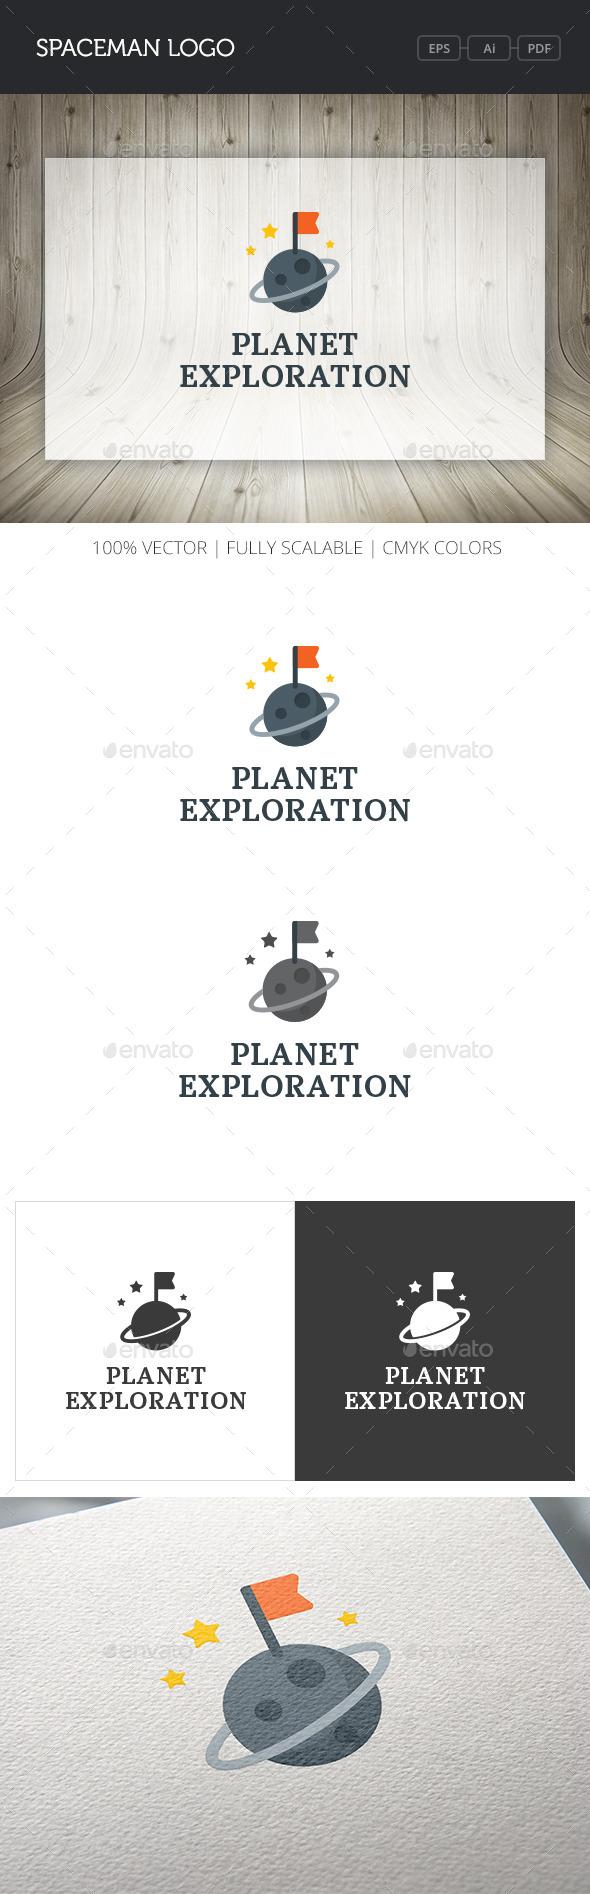 GraphicRiver Planet Exploration Logo 10755337